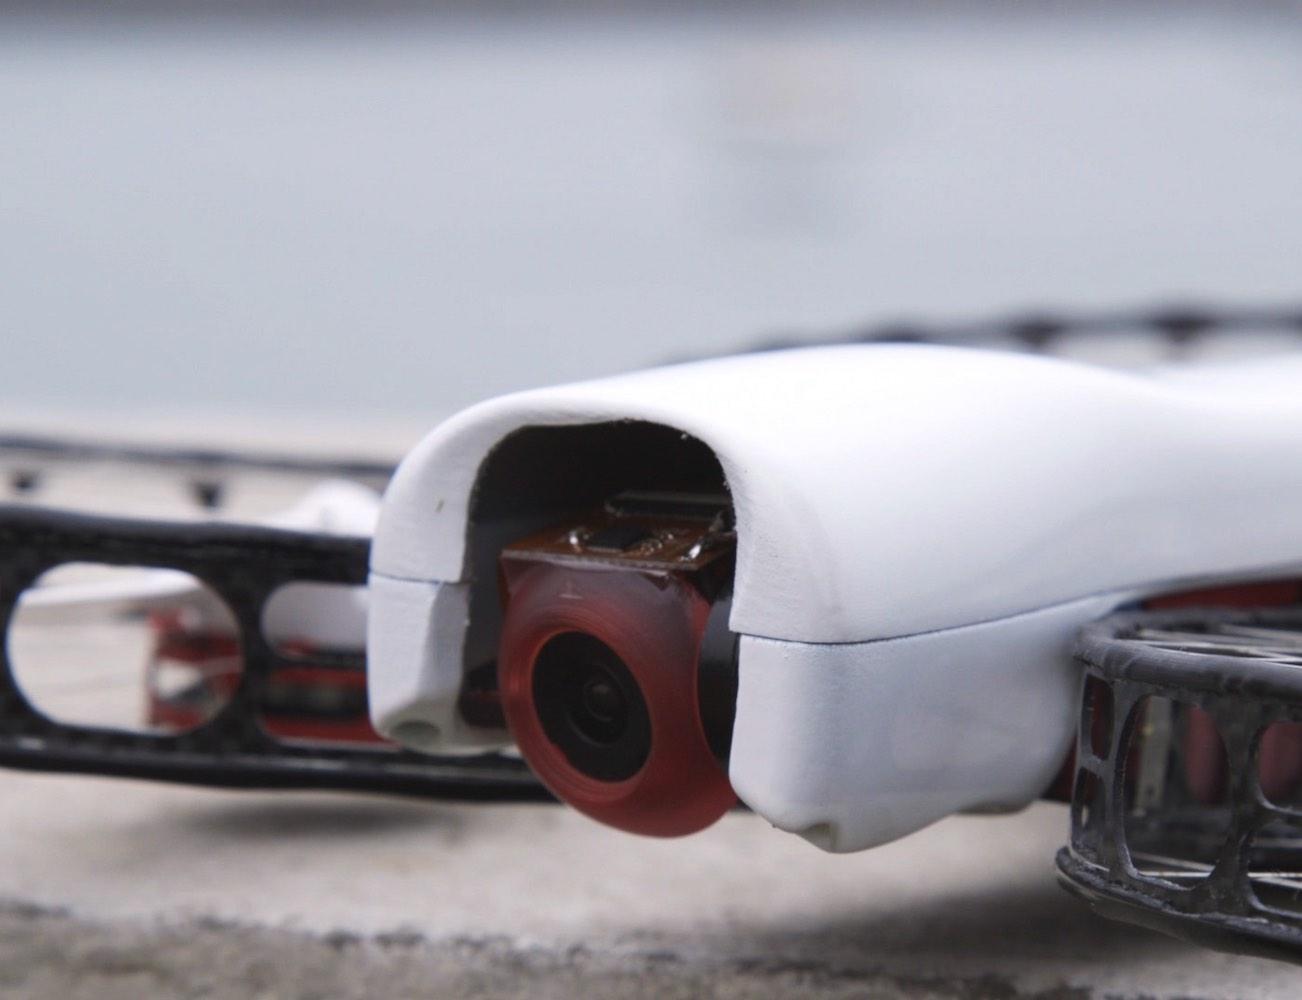 Snap – The Flying Camera from Vantage Robotics